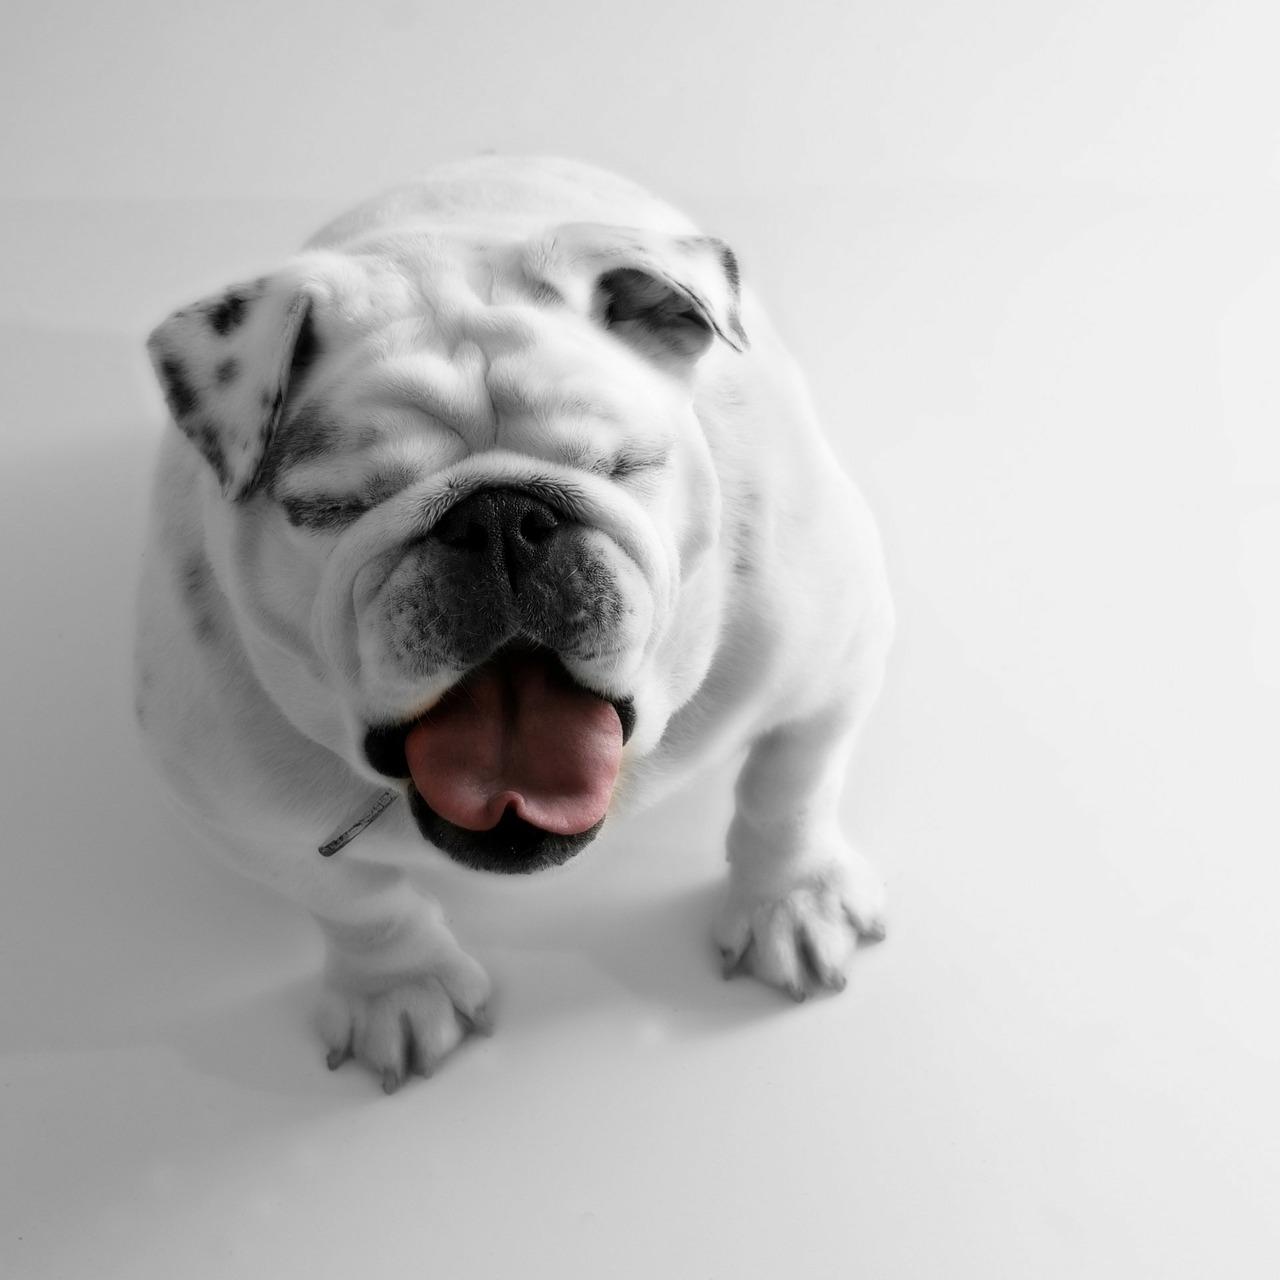 bulldog 5